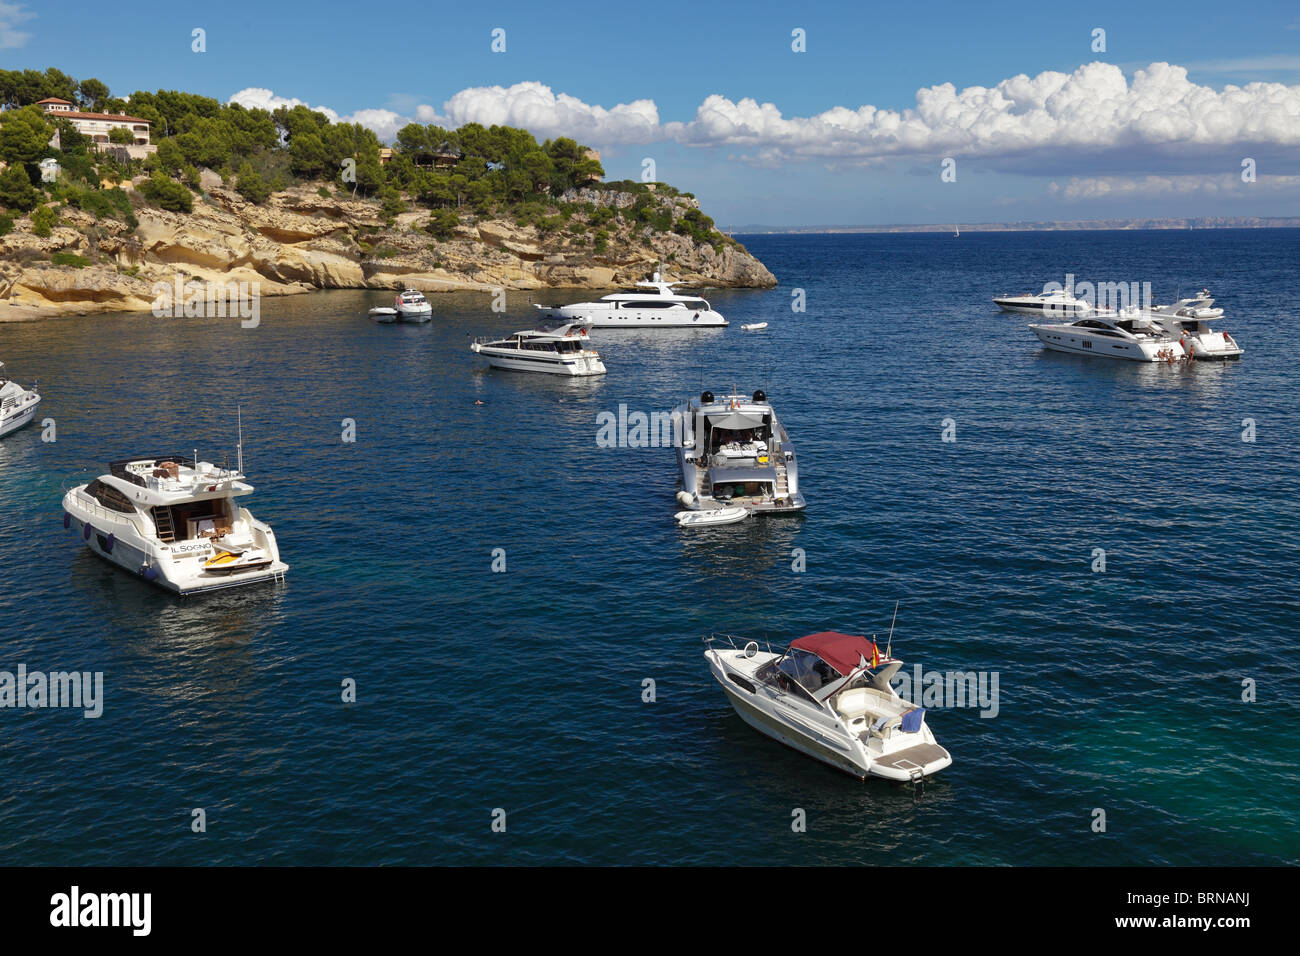 ESP Spain Balearic Mallorca Portals Vells bay boat rock water sea cloud sky blue idyllic idyl anchoring anchor sun - Stock Image